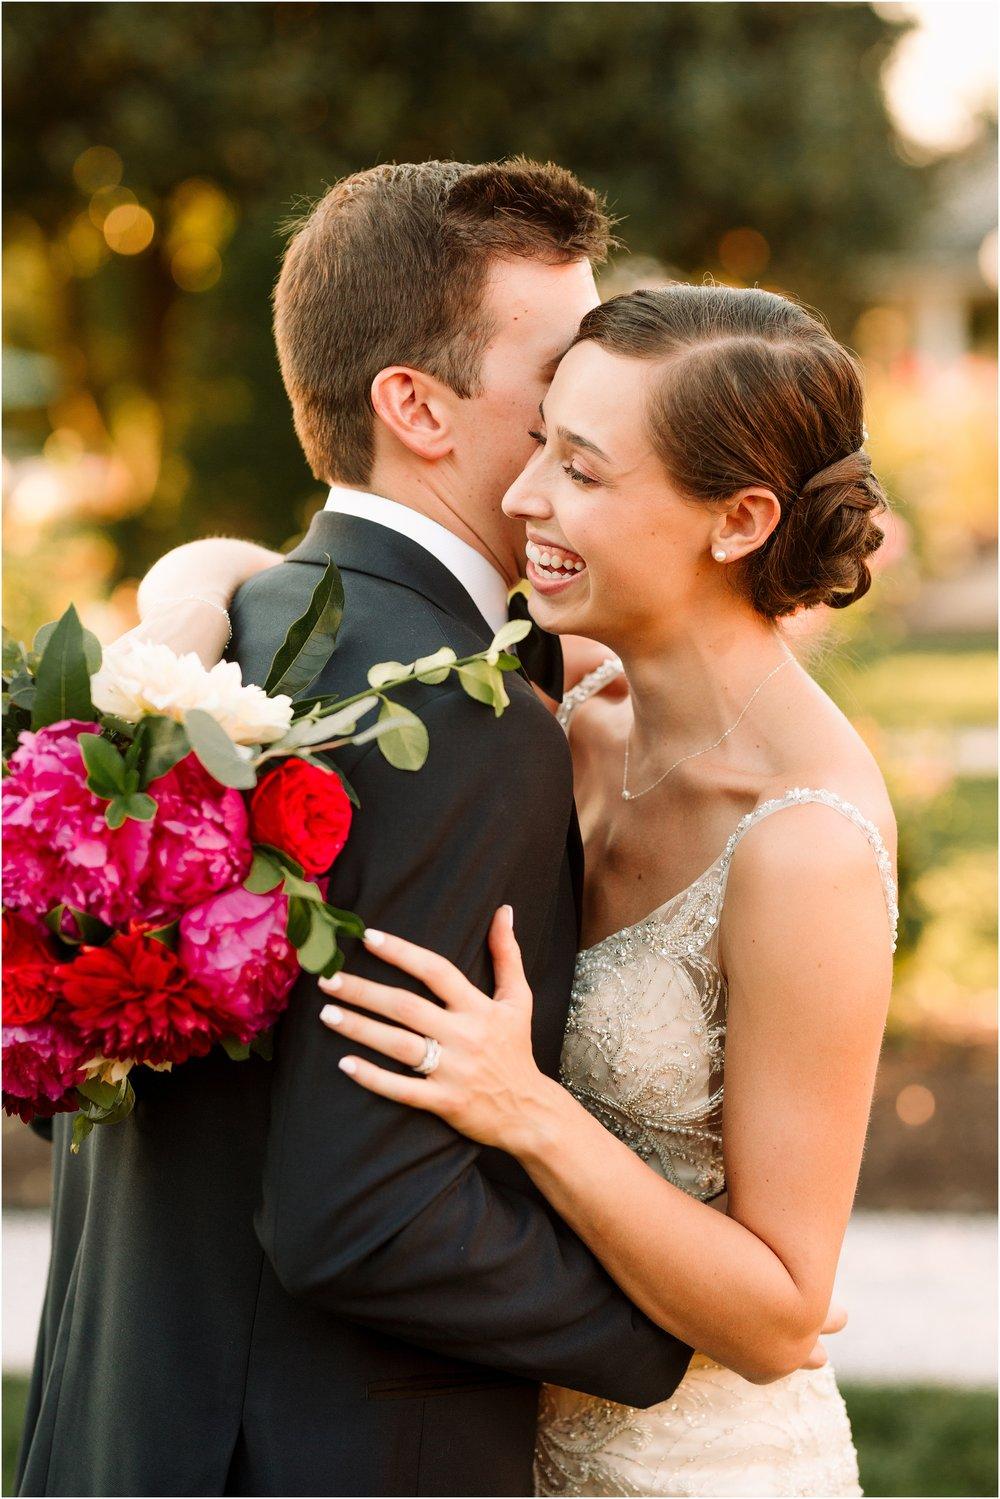 hannah leigh photography Antrim 1844 Wedding_1262.jpg